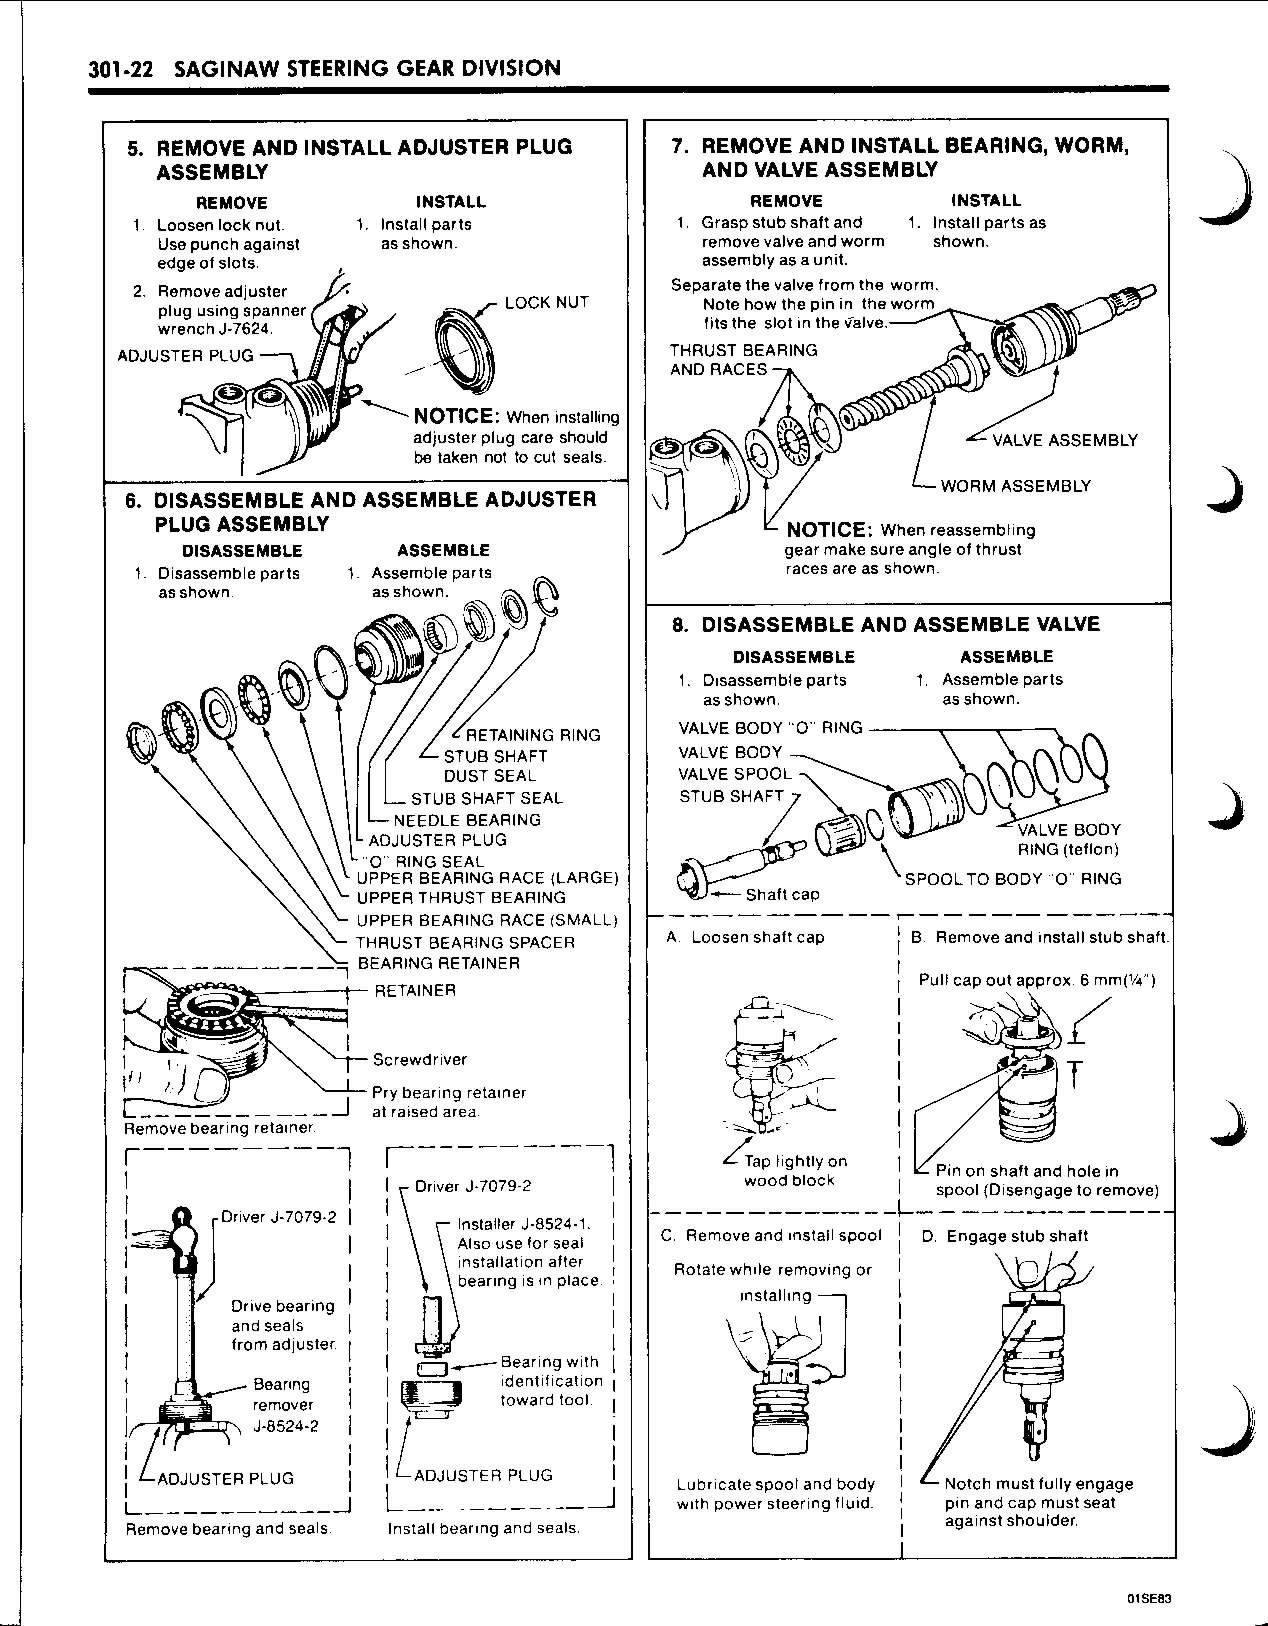 Saginaw Power Steering Box Diagram Image Details Nissan Micra K12 Fuse Guide